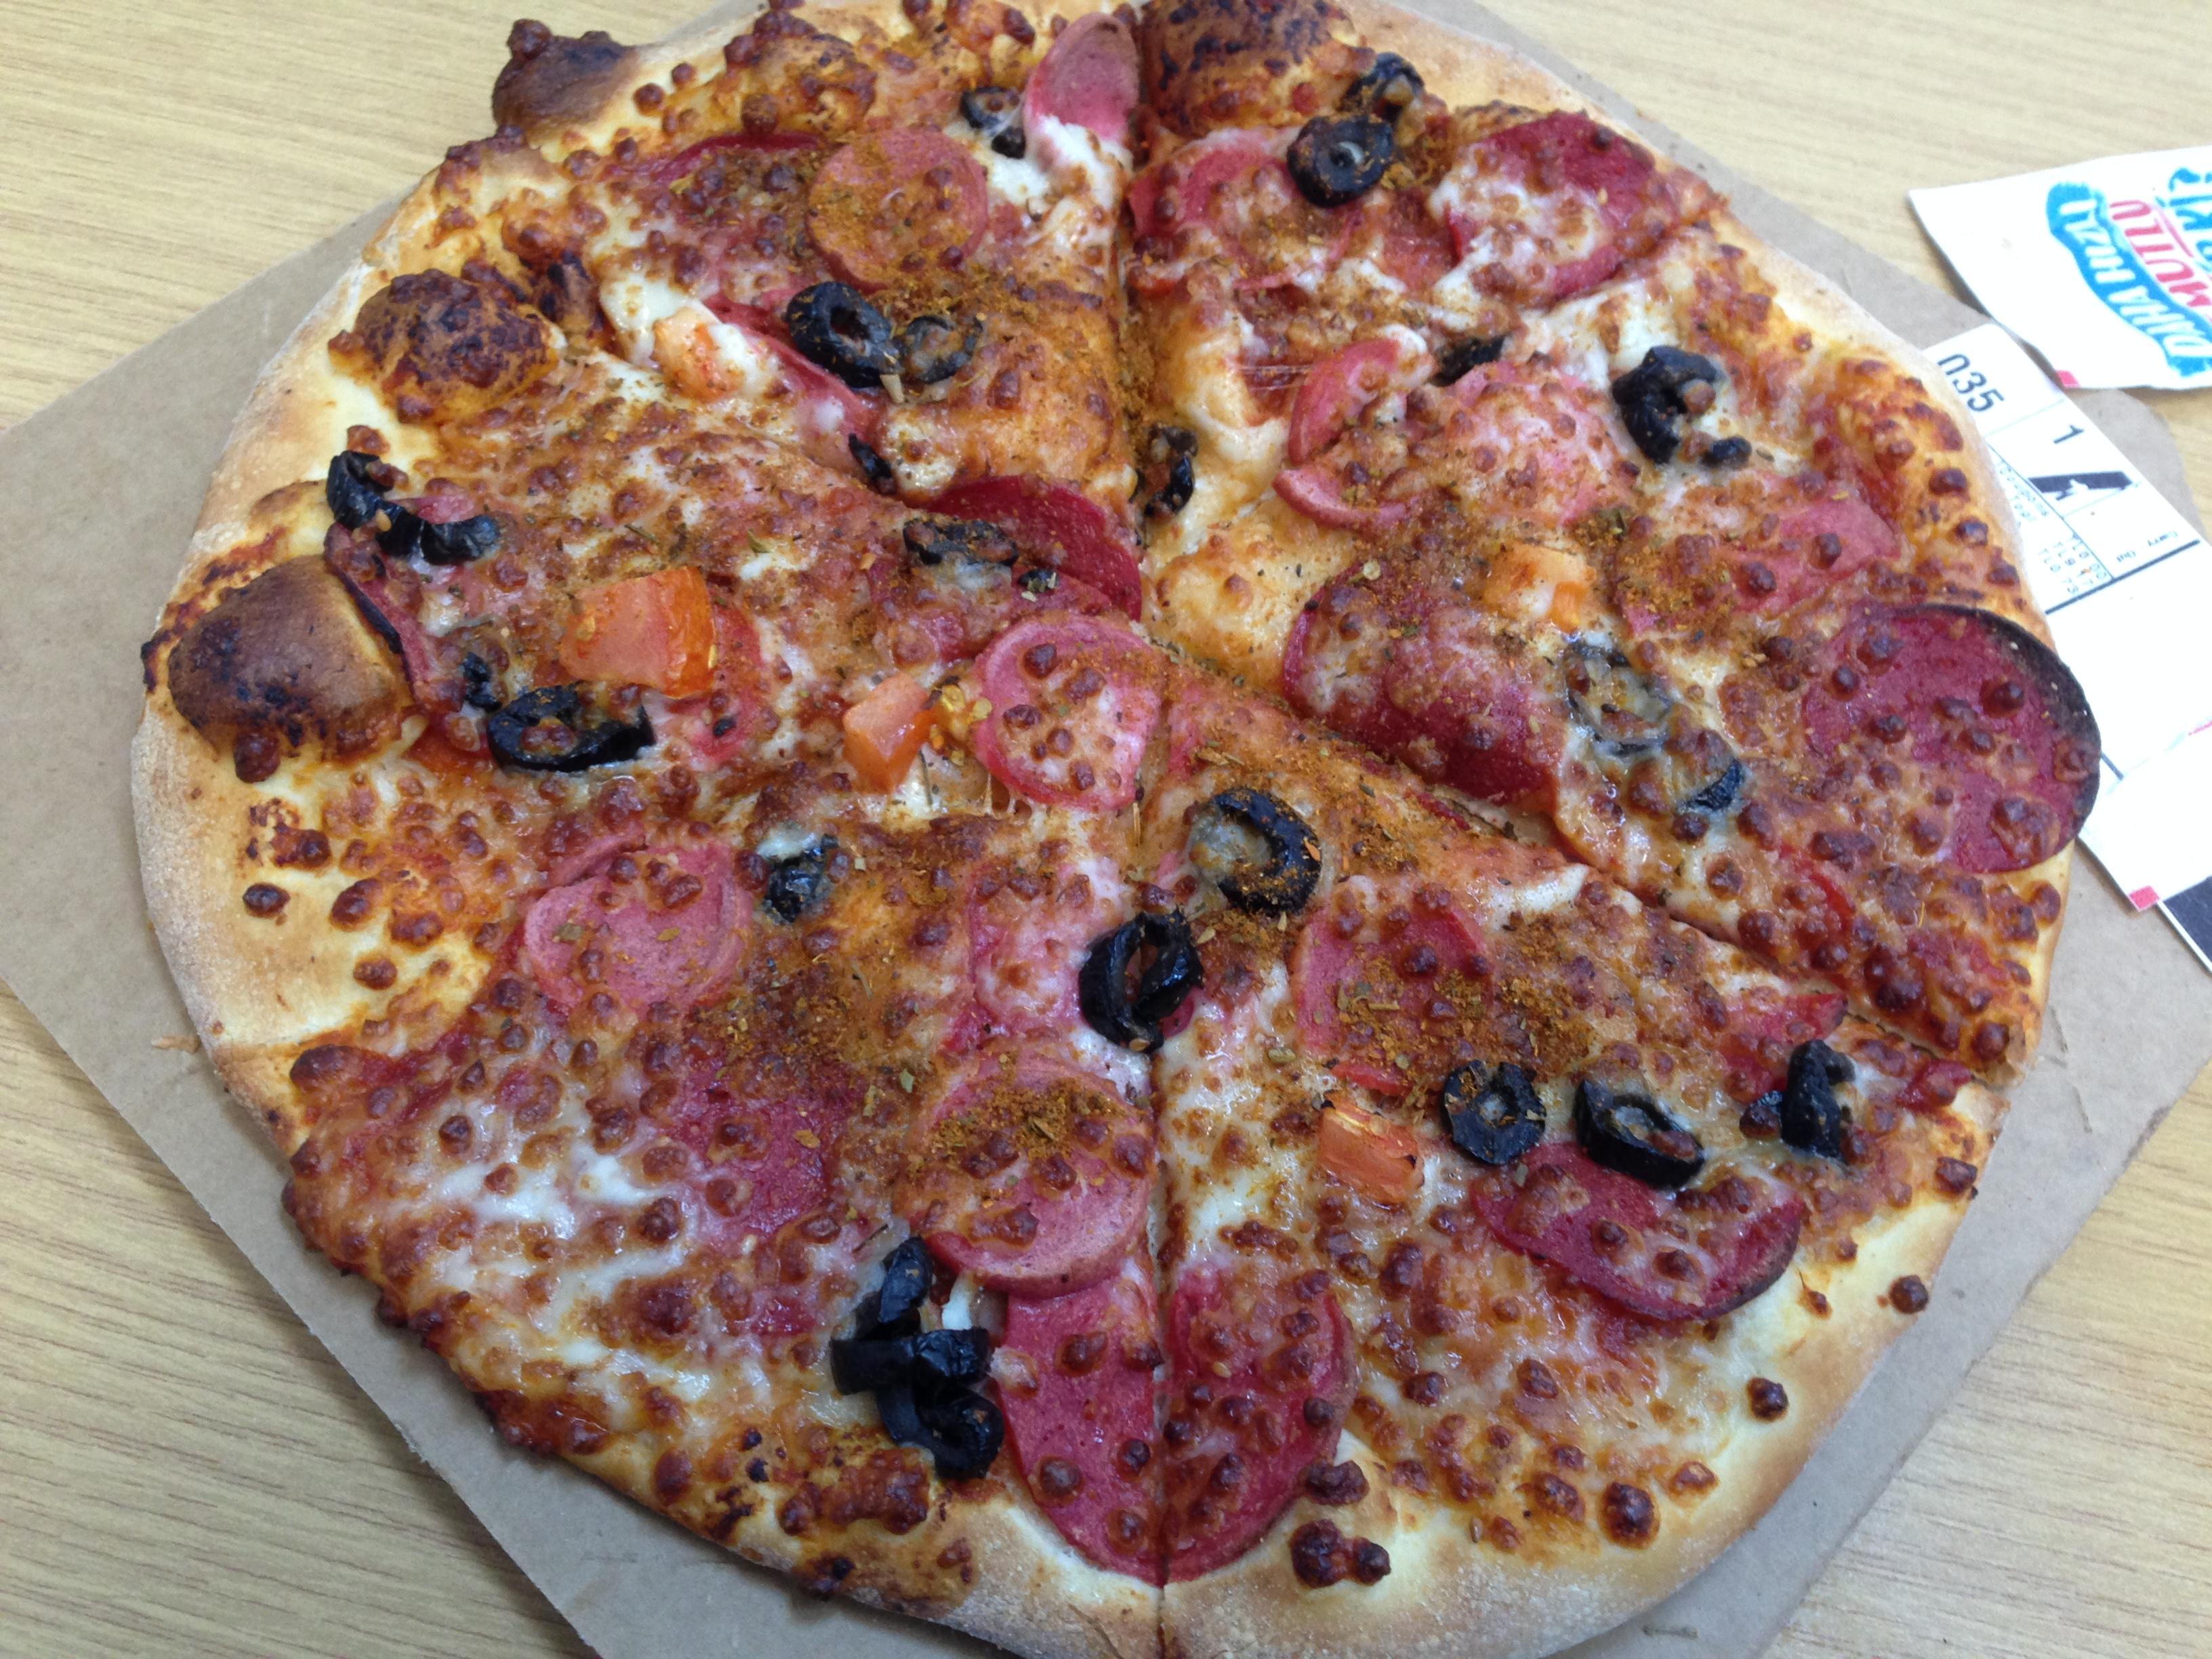 Dominos Pizza Gel Alda Orta Boy Dopdolu Pizza 990 Tl140 Tl